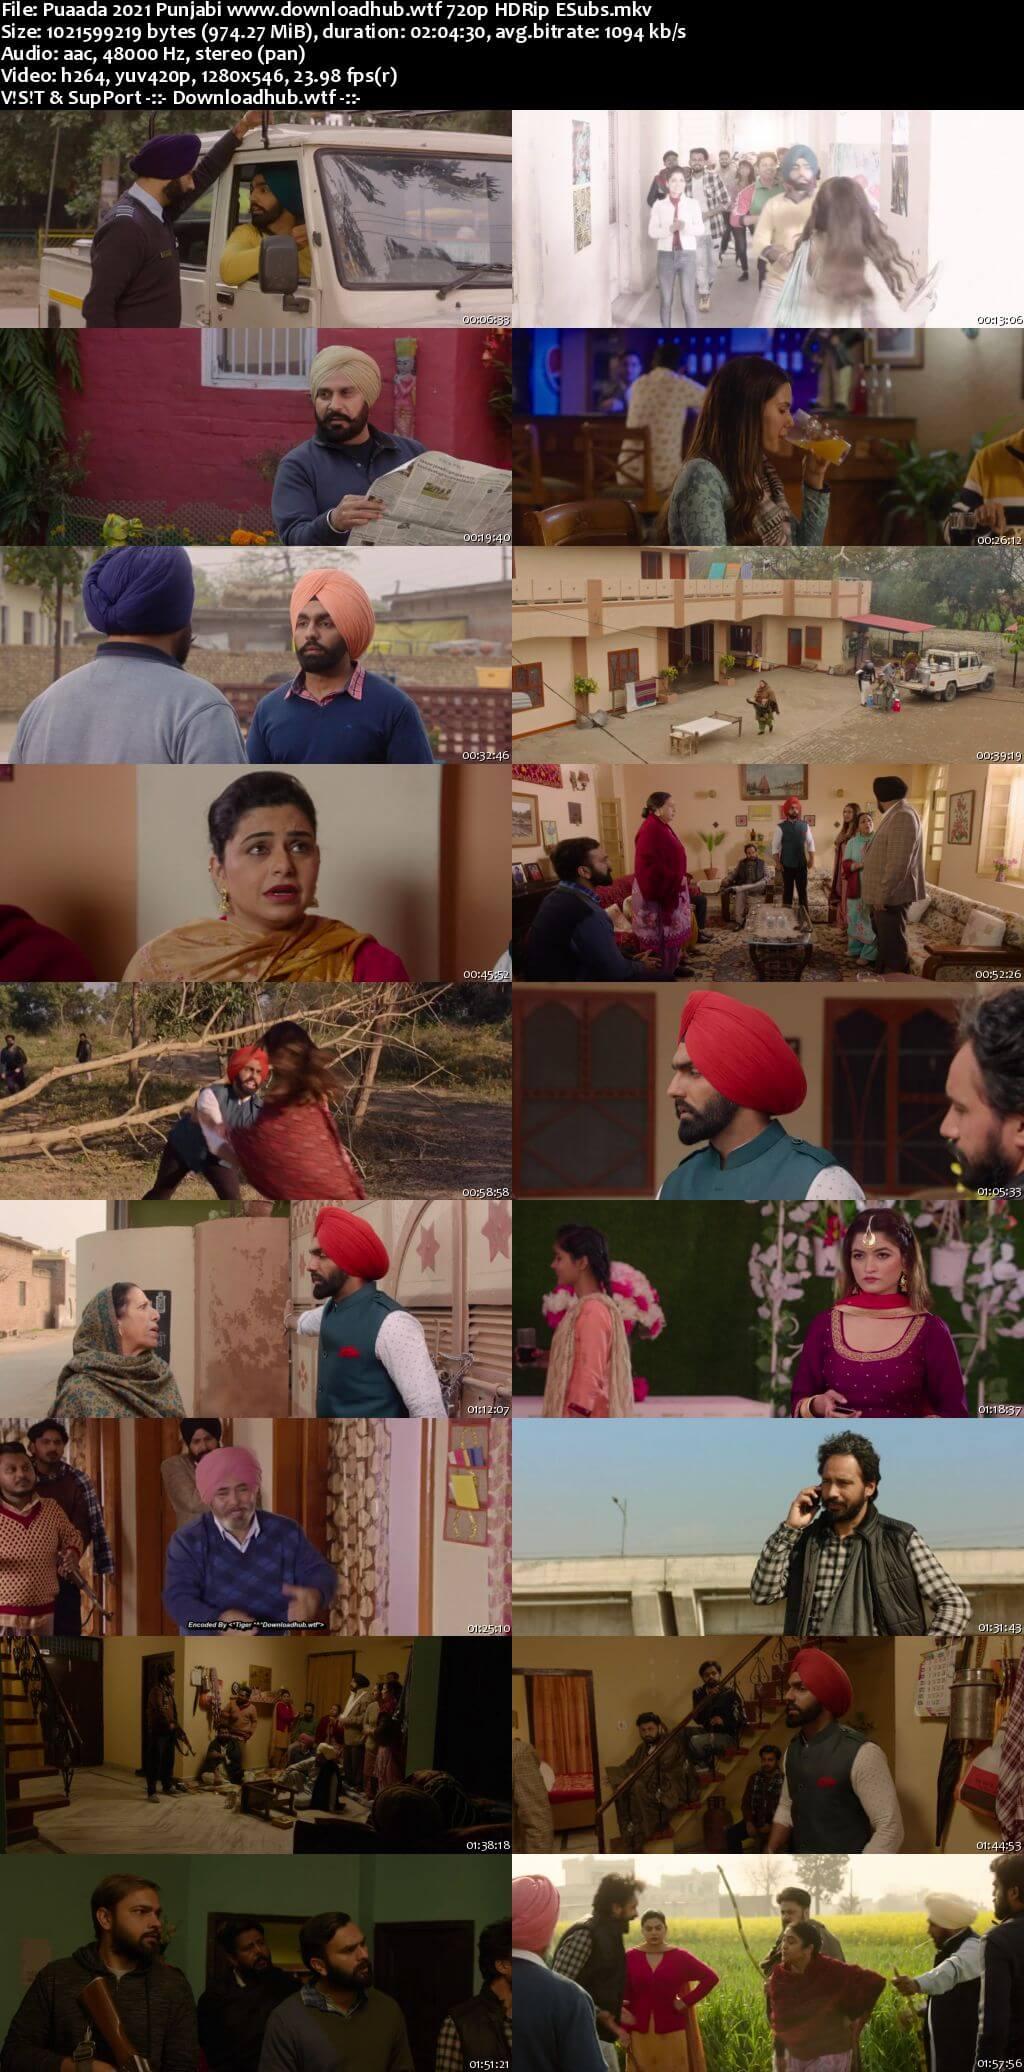 Puaada 2021 Punjabi 720p HDRip ESubs